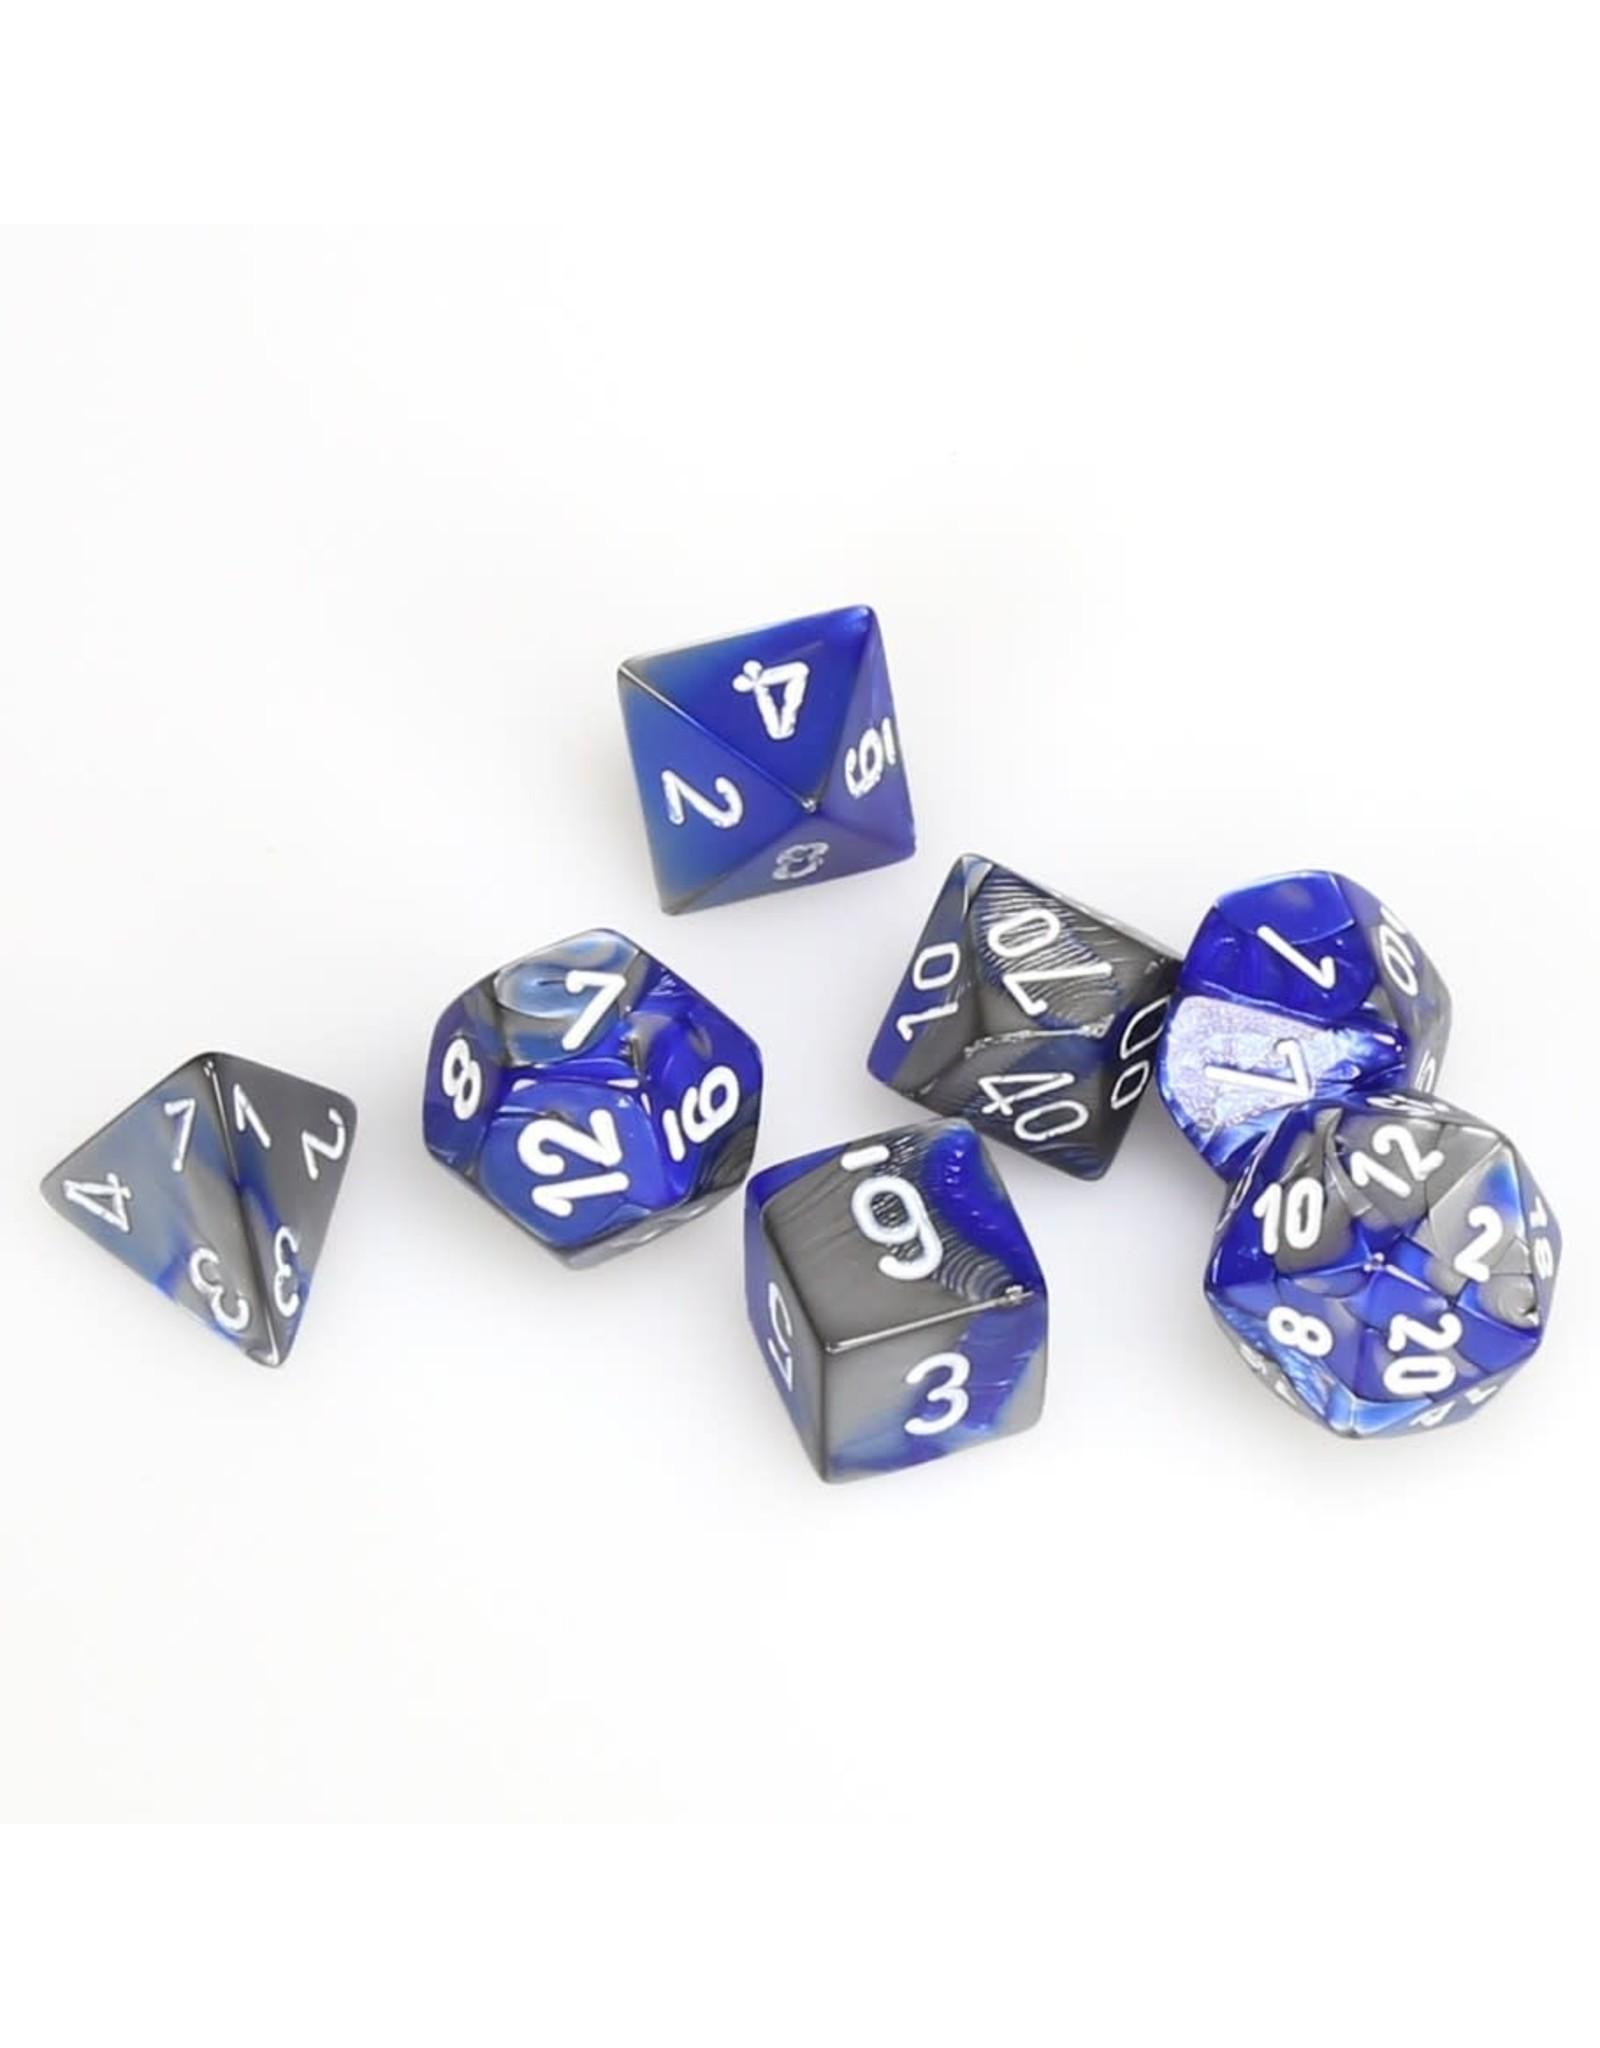 Chessex Polyhedral 7 Dice Set Gemini Blue-Steel w/White CHX26423